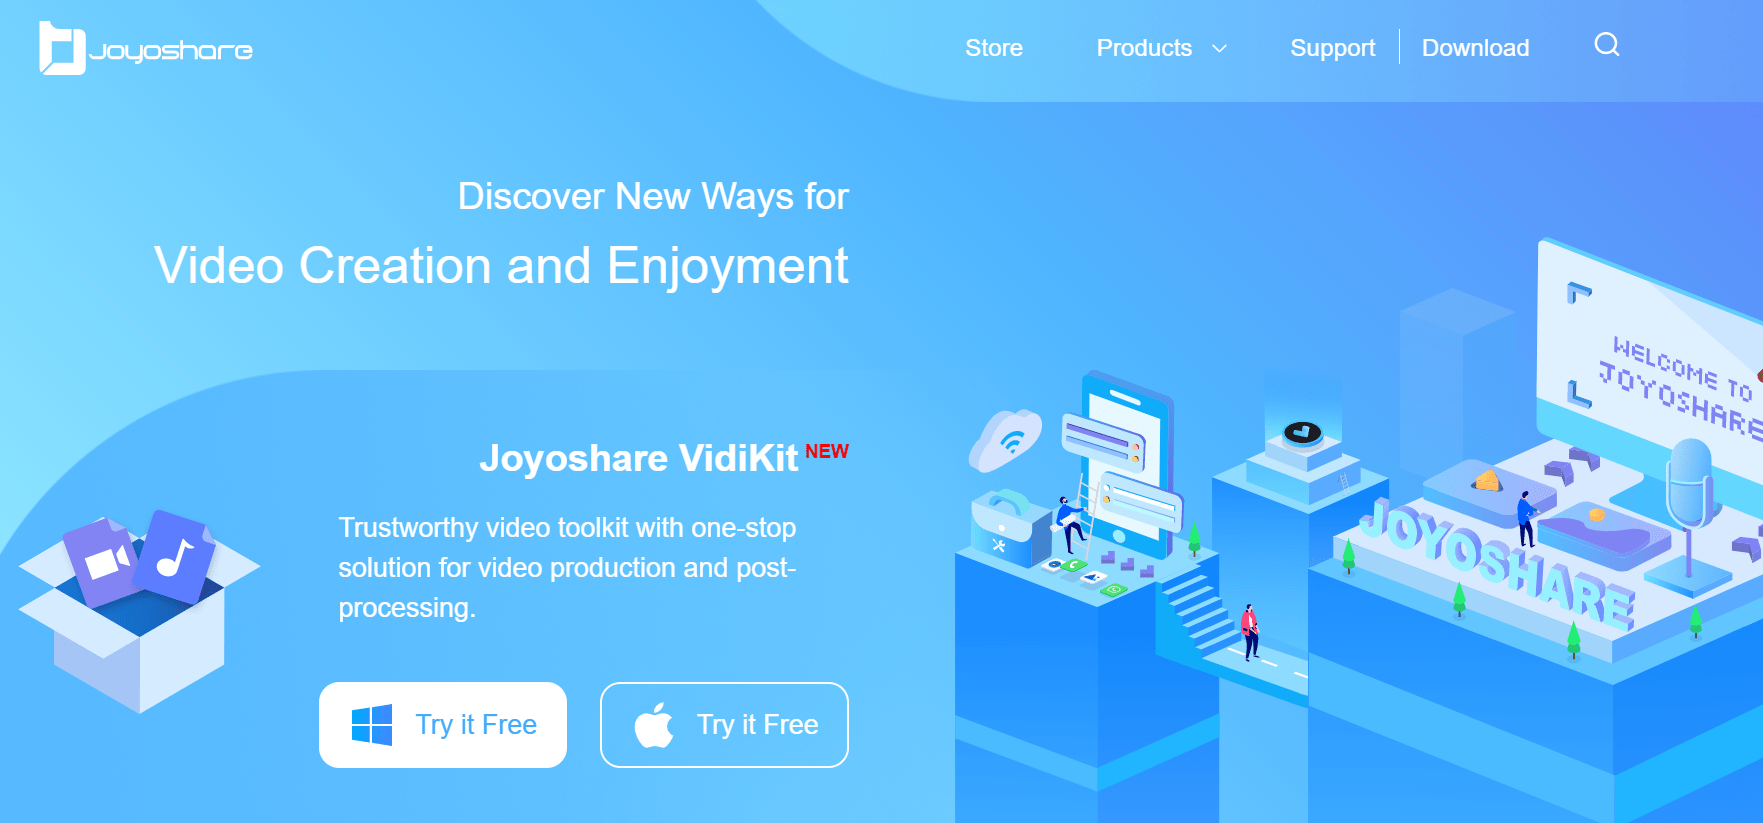 joyoshare review